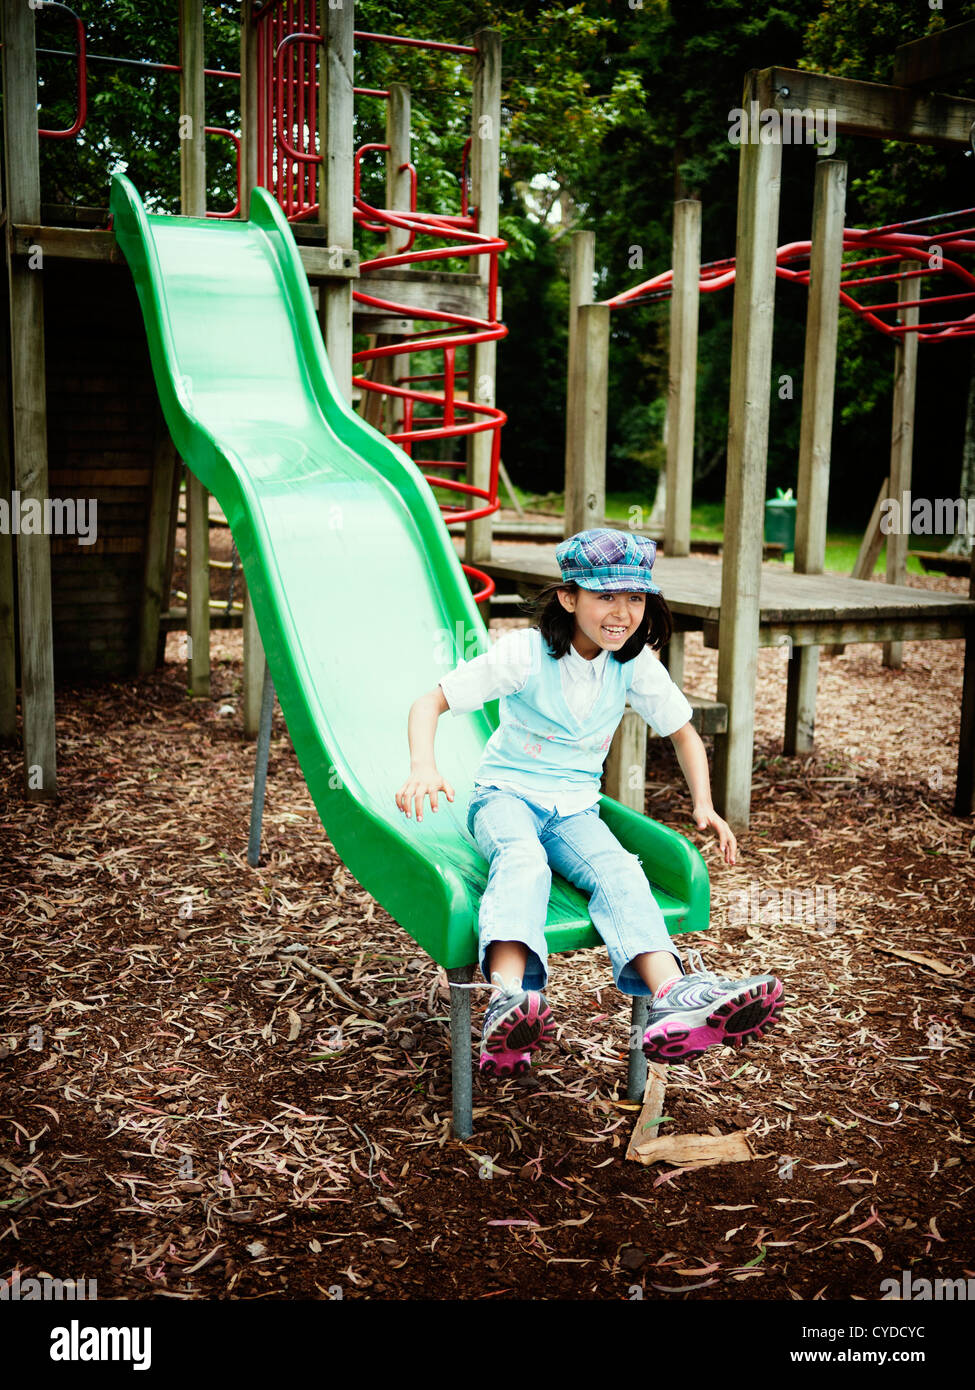 Girl shoots off end of slide. - Stock Image